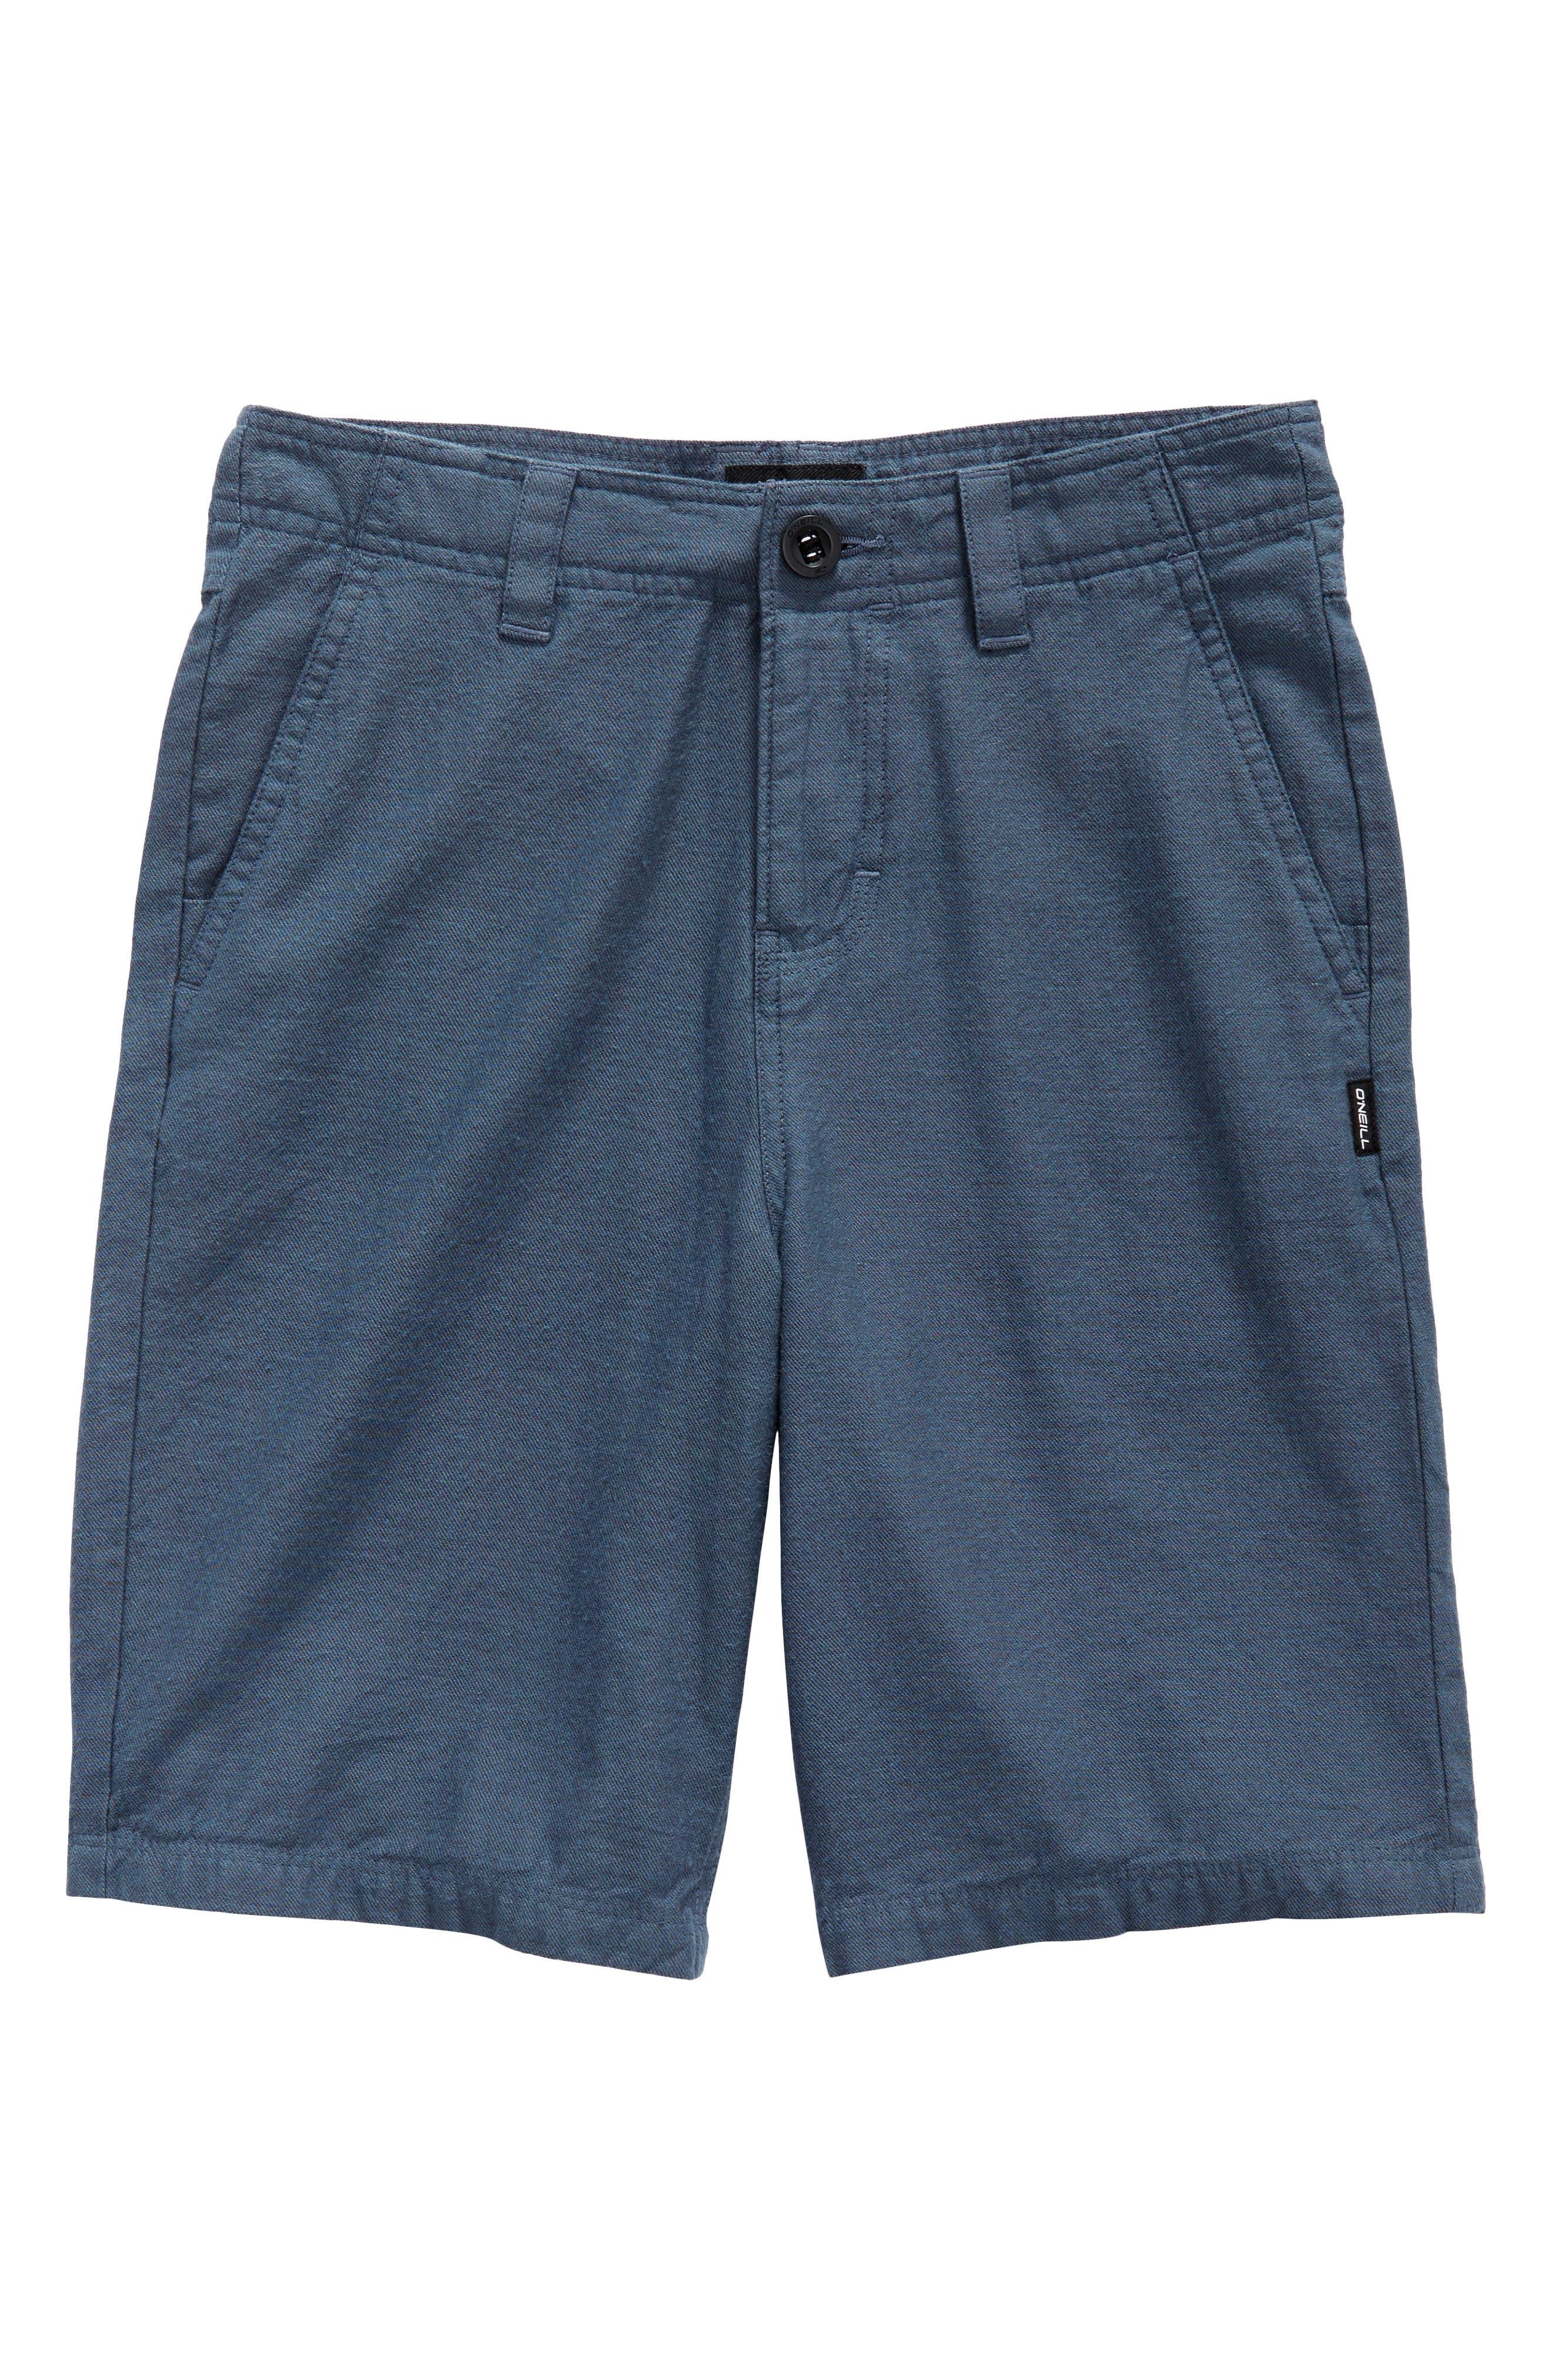 Scranton Chino Shorts,                             Main thumbnail 1, color,                             Slate